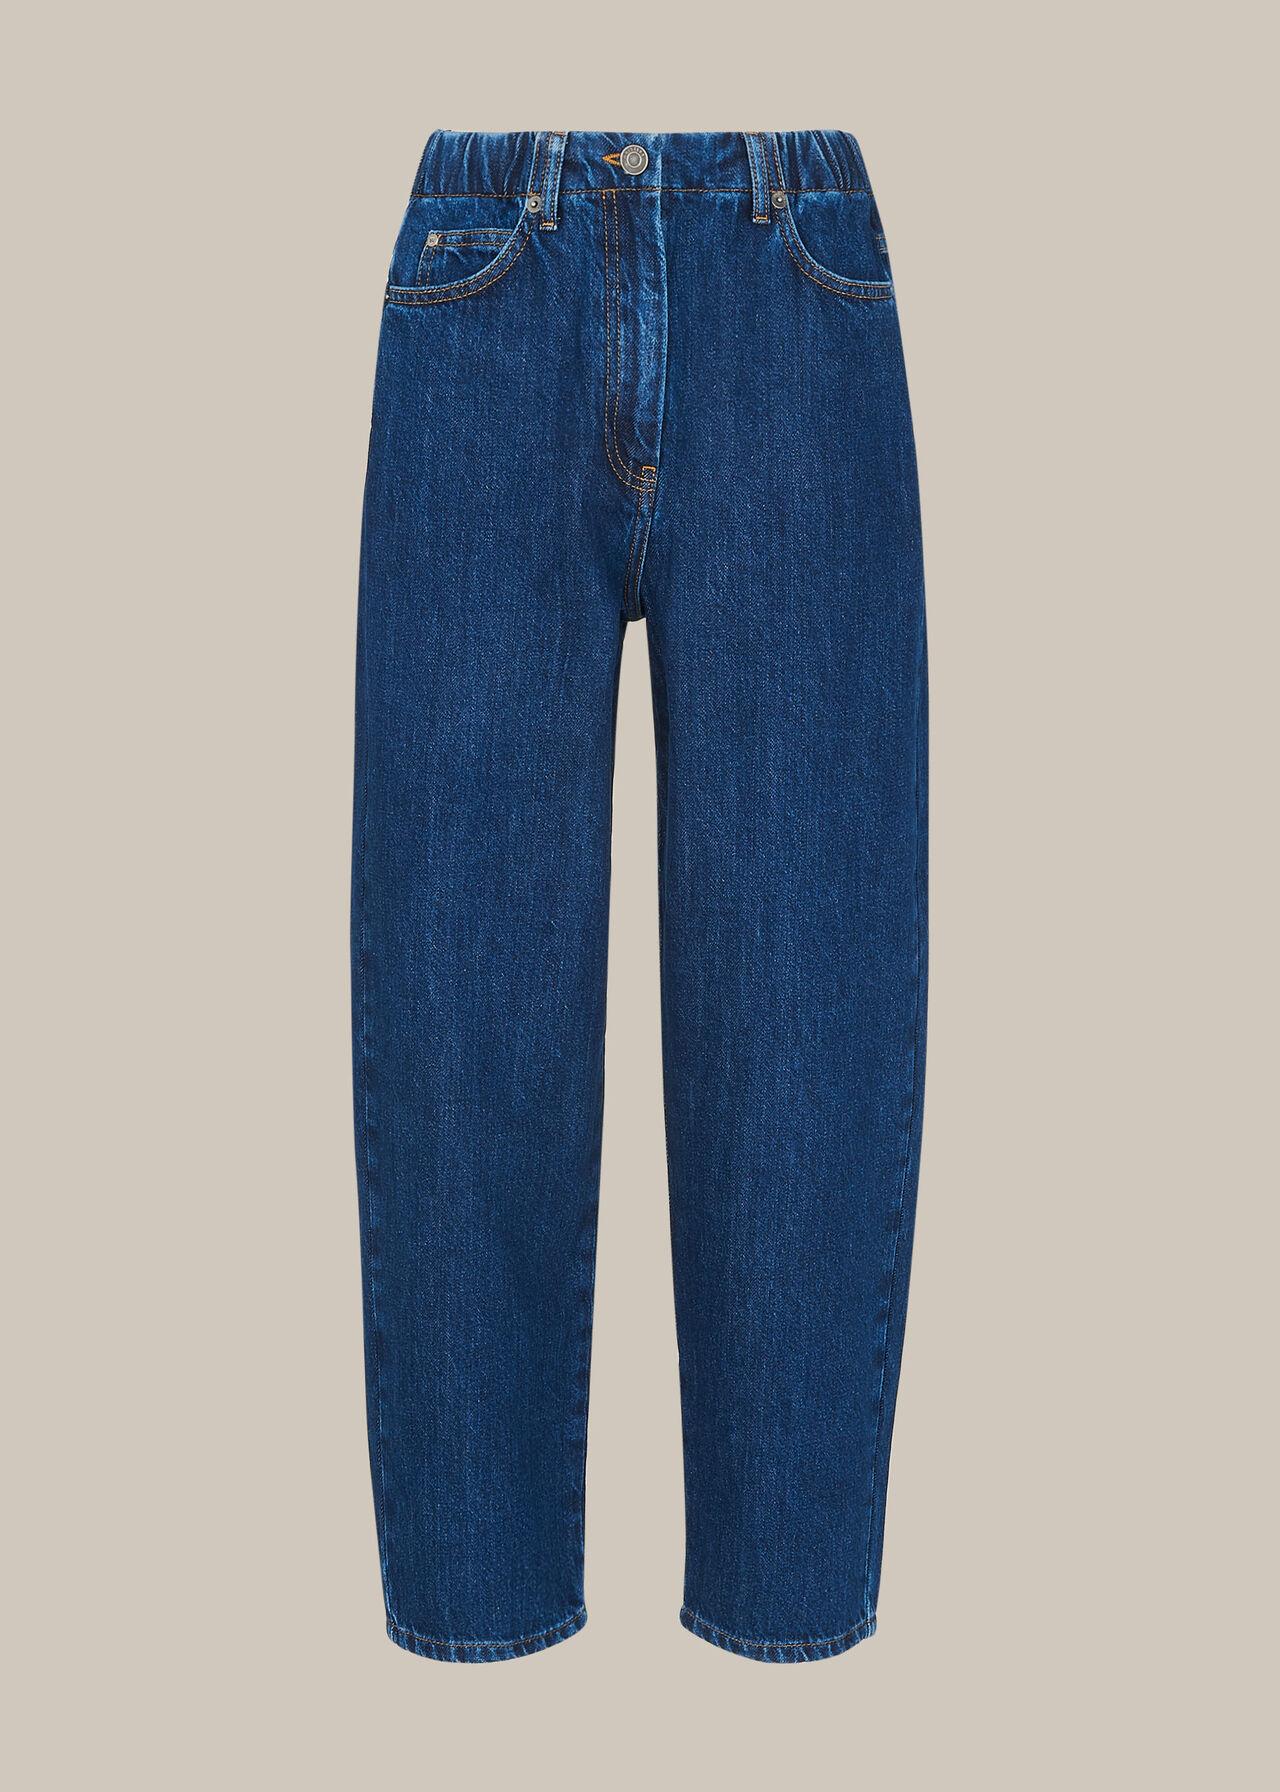 Elasticated Waist Jean